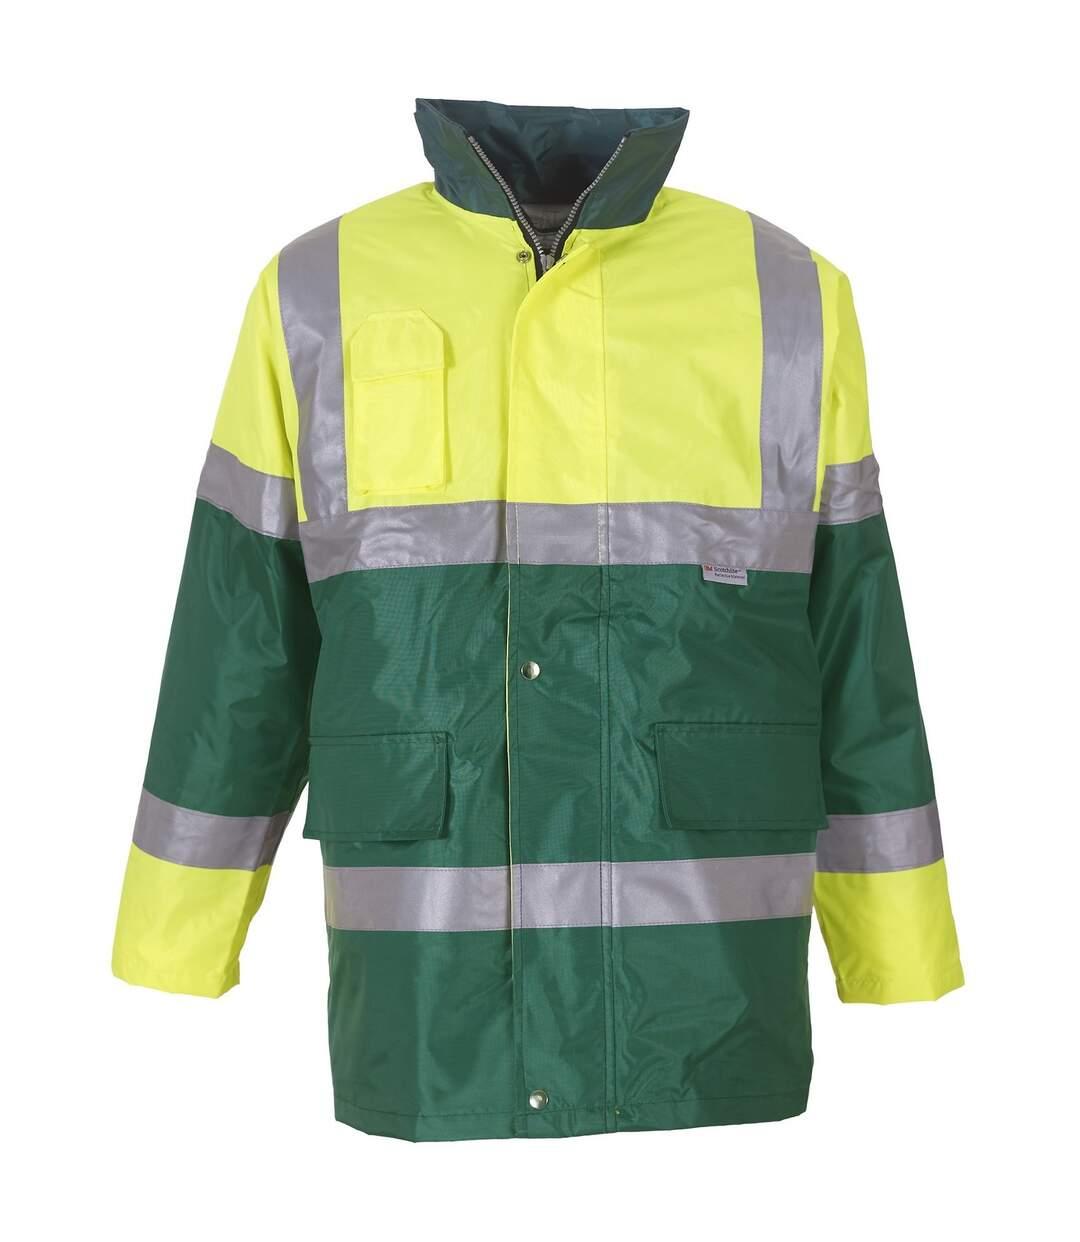 Yoko Mens Hi Vis Contrast Safety Jacket (Yellow/ Paramedic Green) - UTRW4681